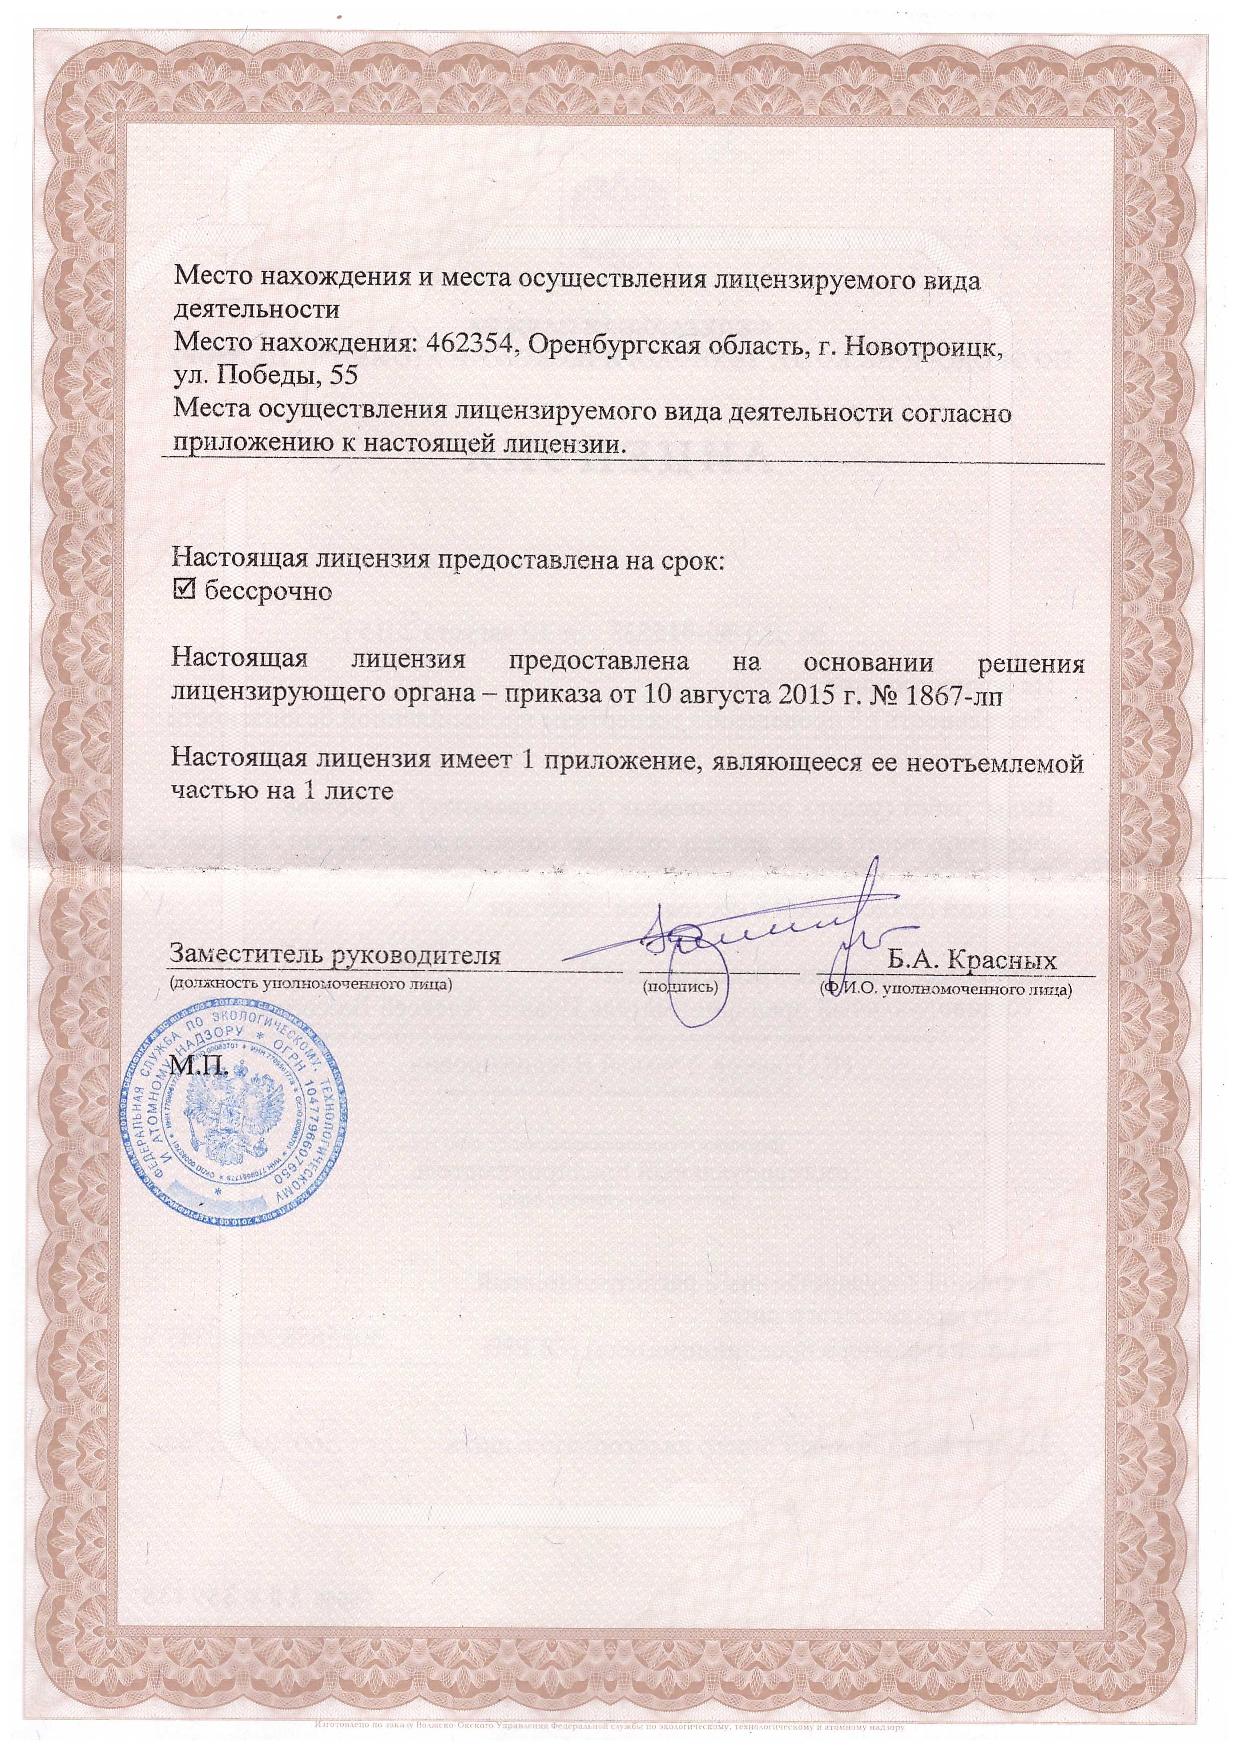 http://ivanov56.ru/img/0a89b8e56aa6358ae14cae8963d3ed44.jpg